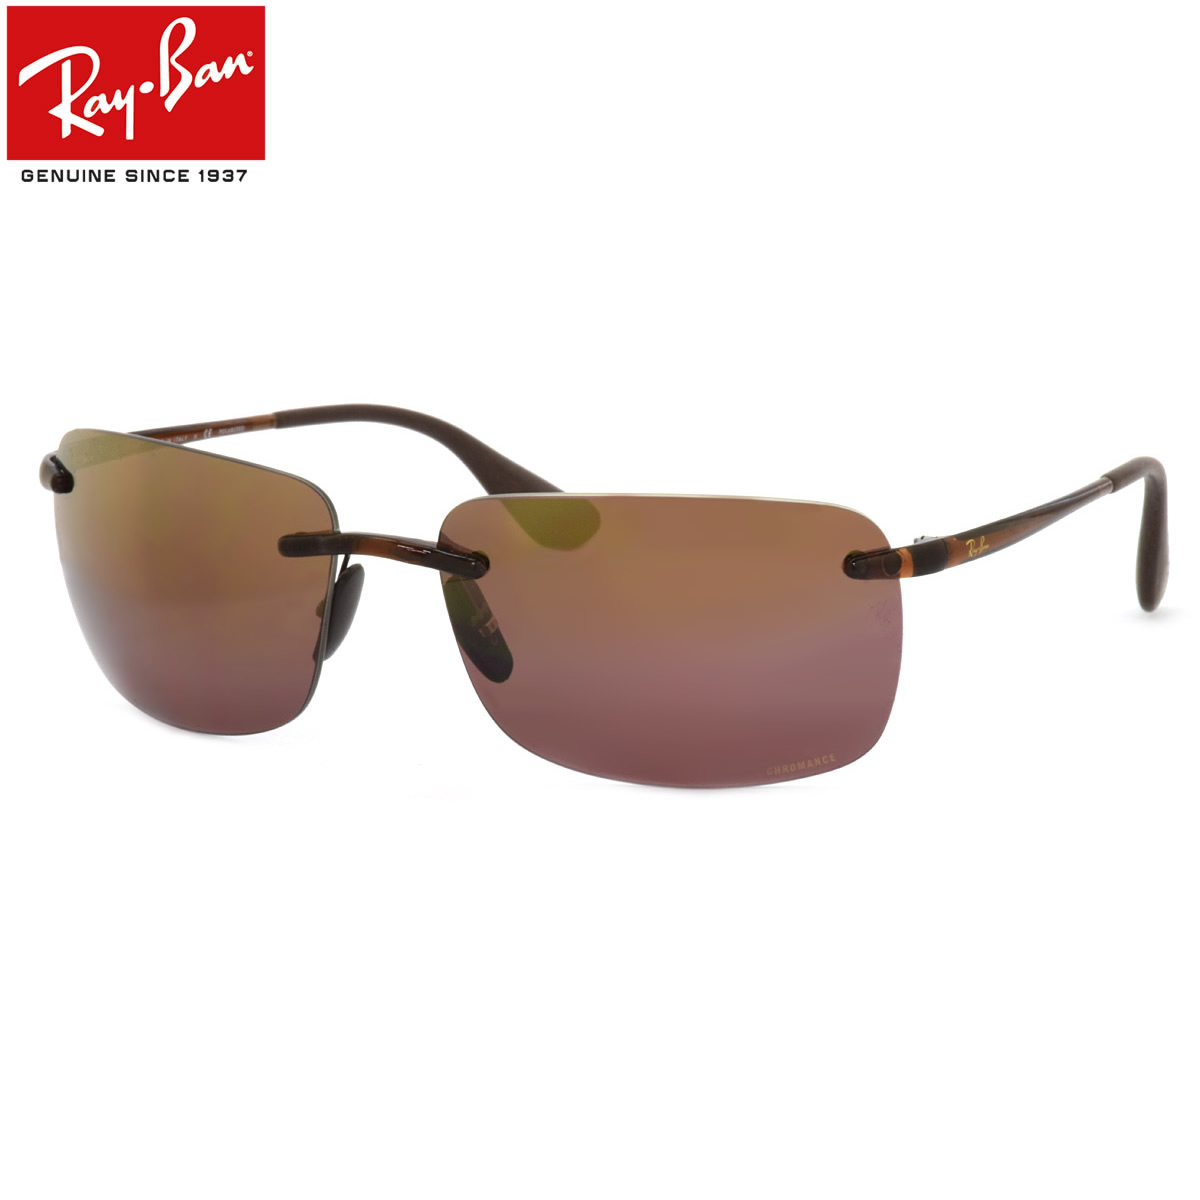 c6fc17e515af4 ... best price optical shop thats rakuten global market ray ban sunglasses  rb4255 604 6b f2f6e 56d54